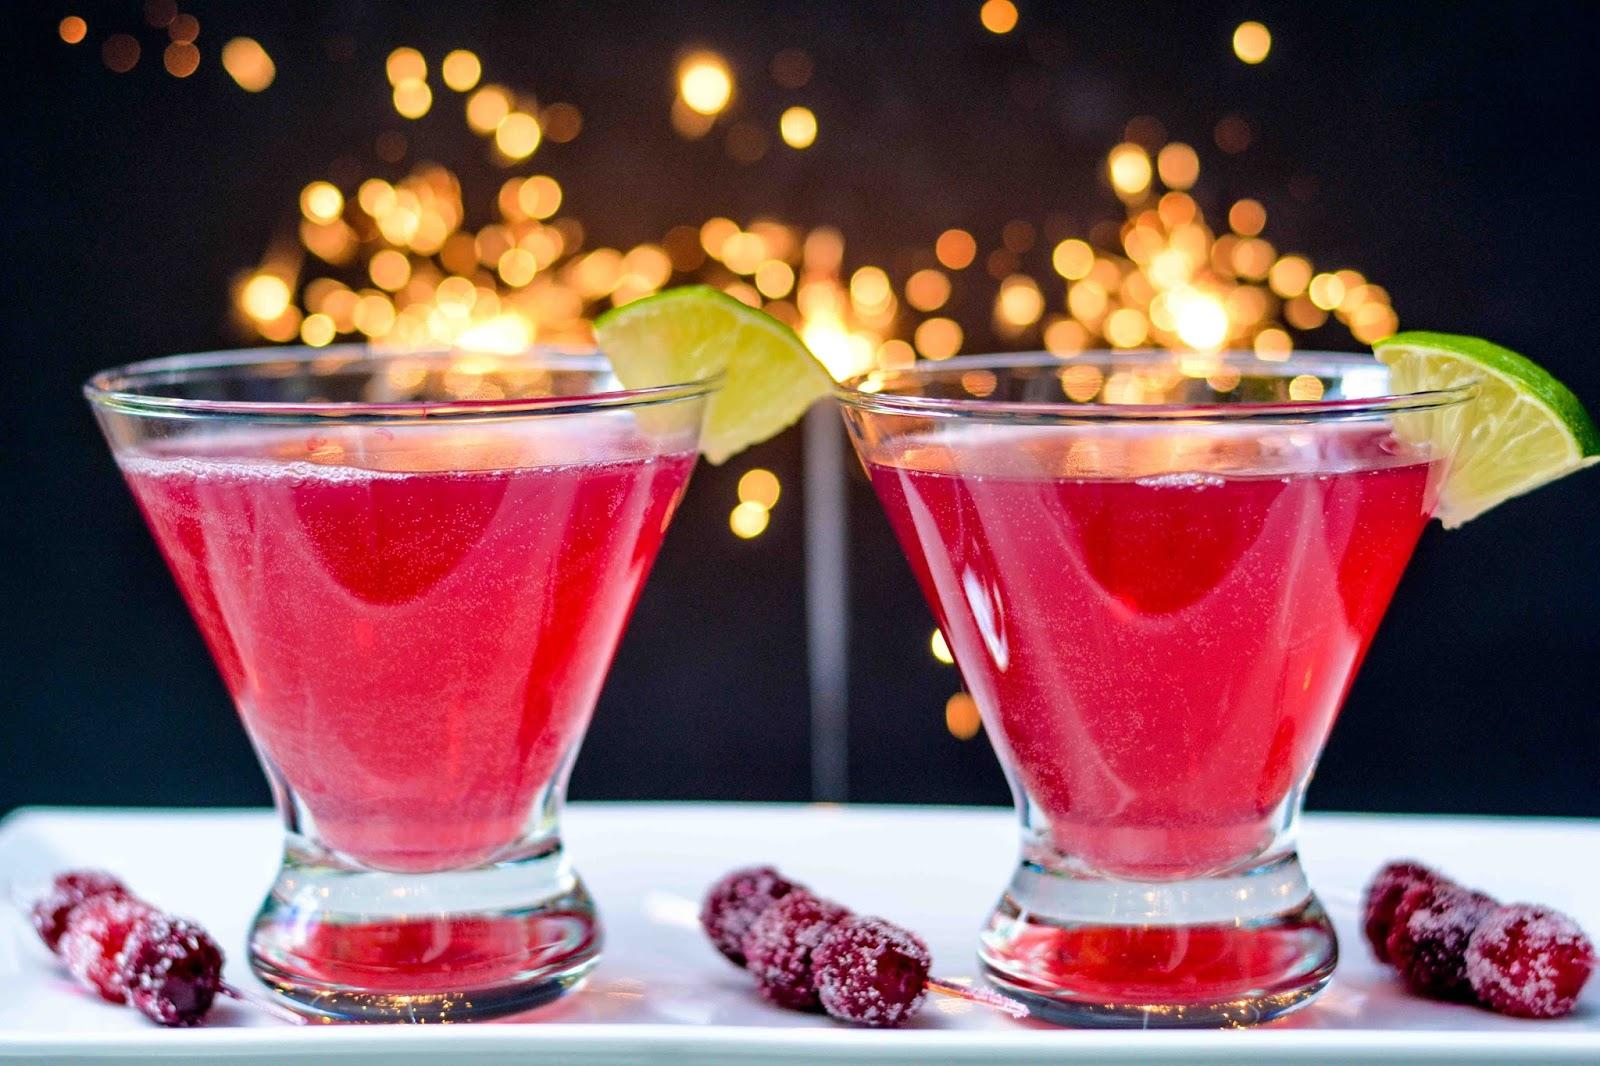 Pomegranate Cranberry Cocktail